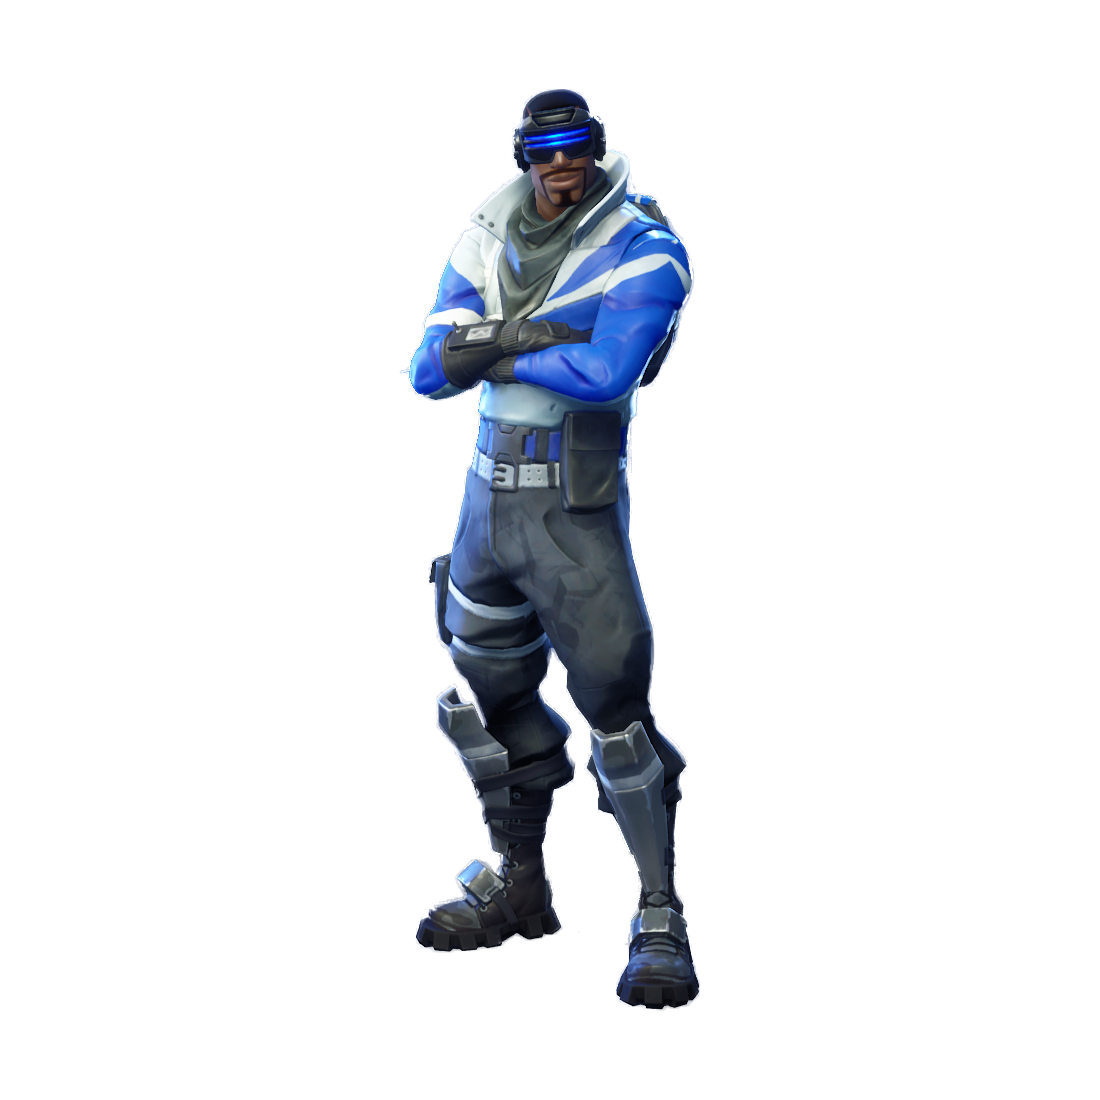 fortnite blue striker - fortnite blue striker png